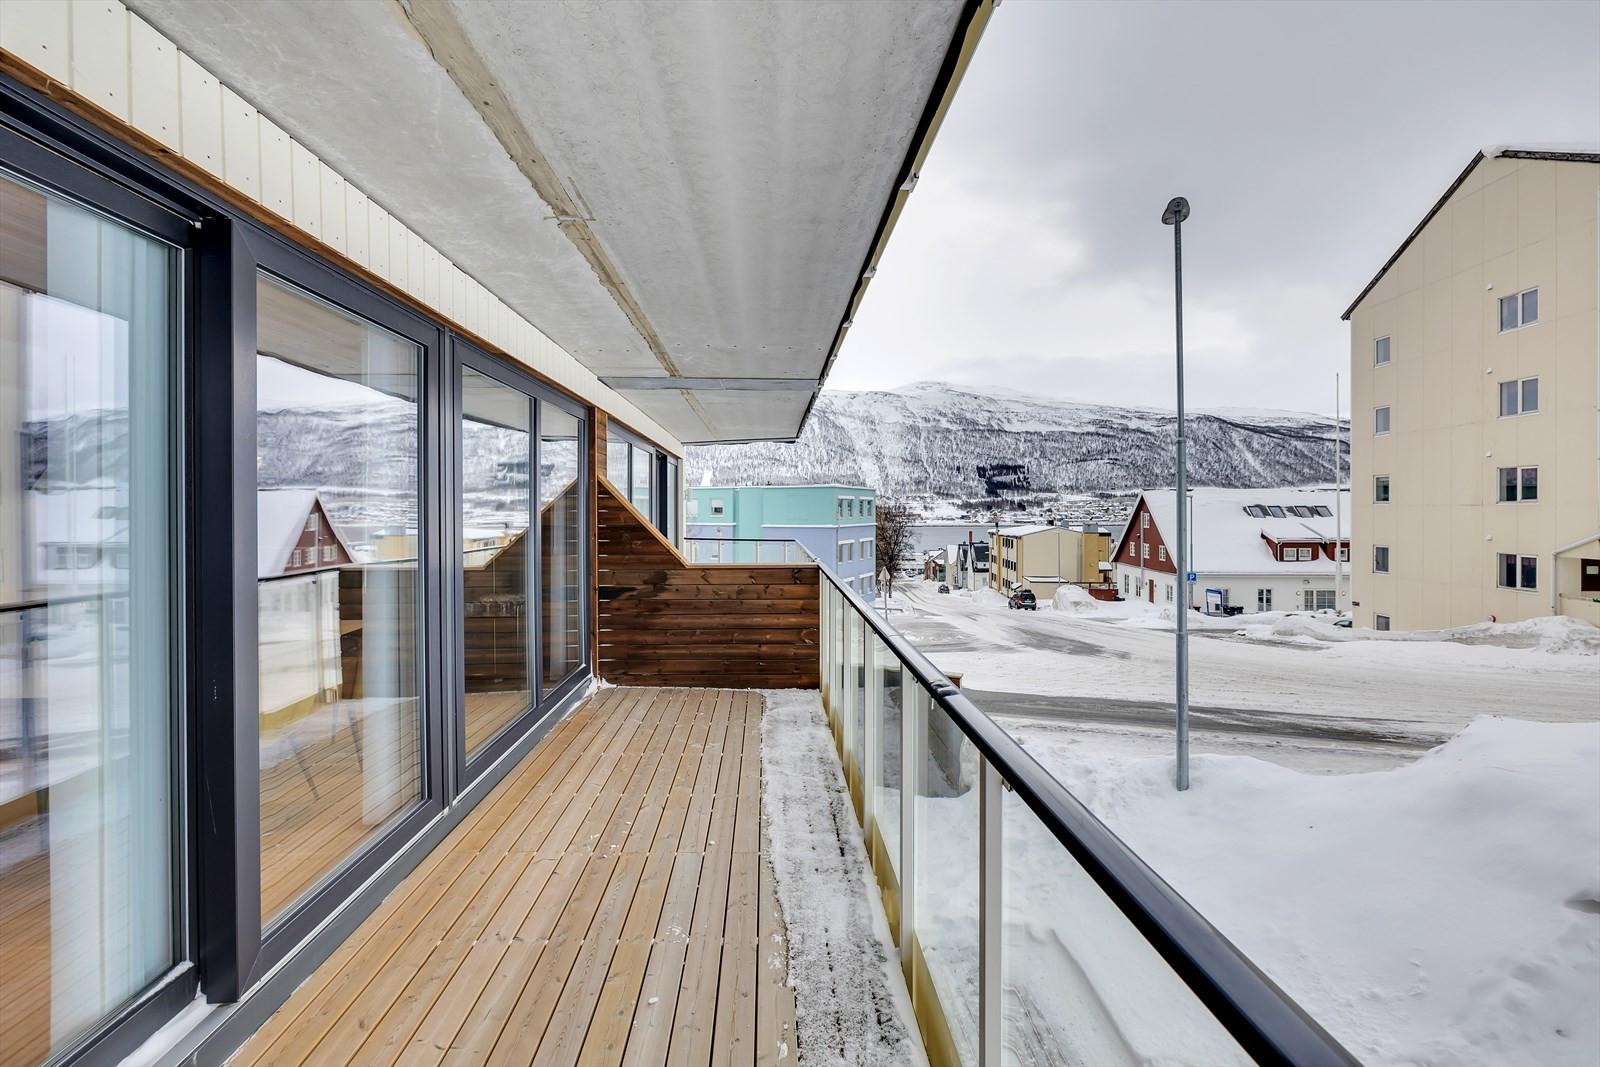 Sørendt og takoverbygget terrasse med gode solforhold